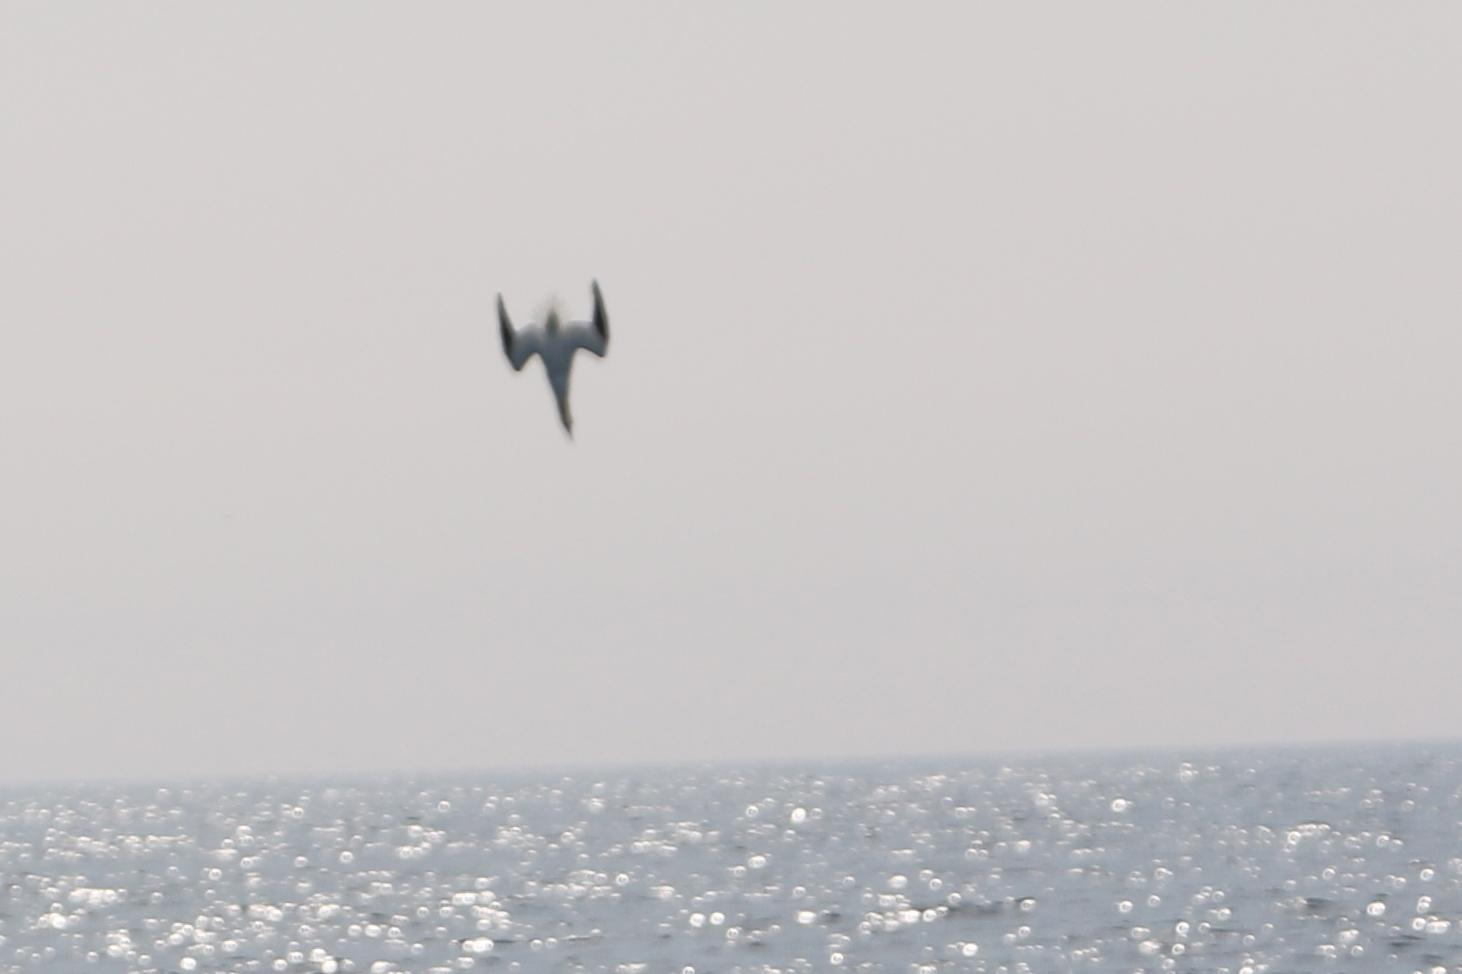 Gannet diving -Photo credit Cian Walsh